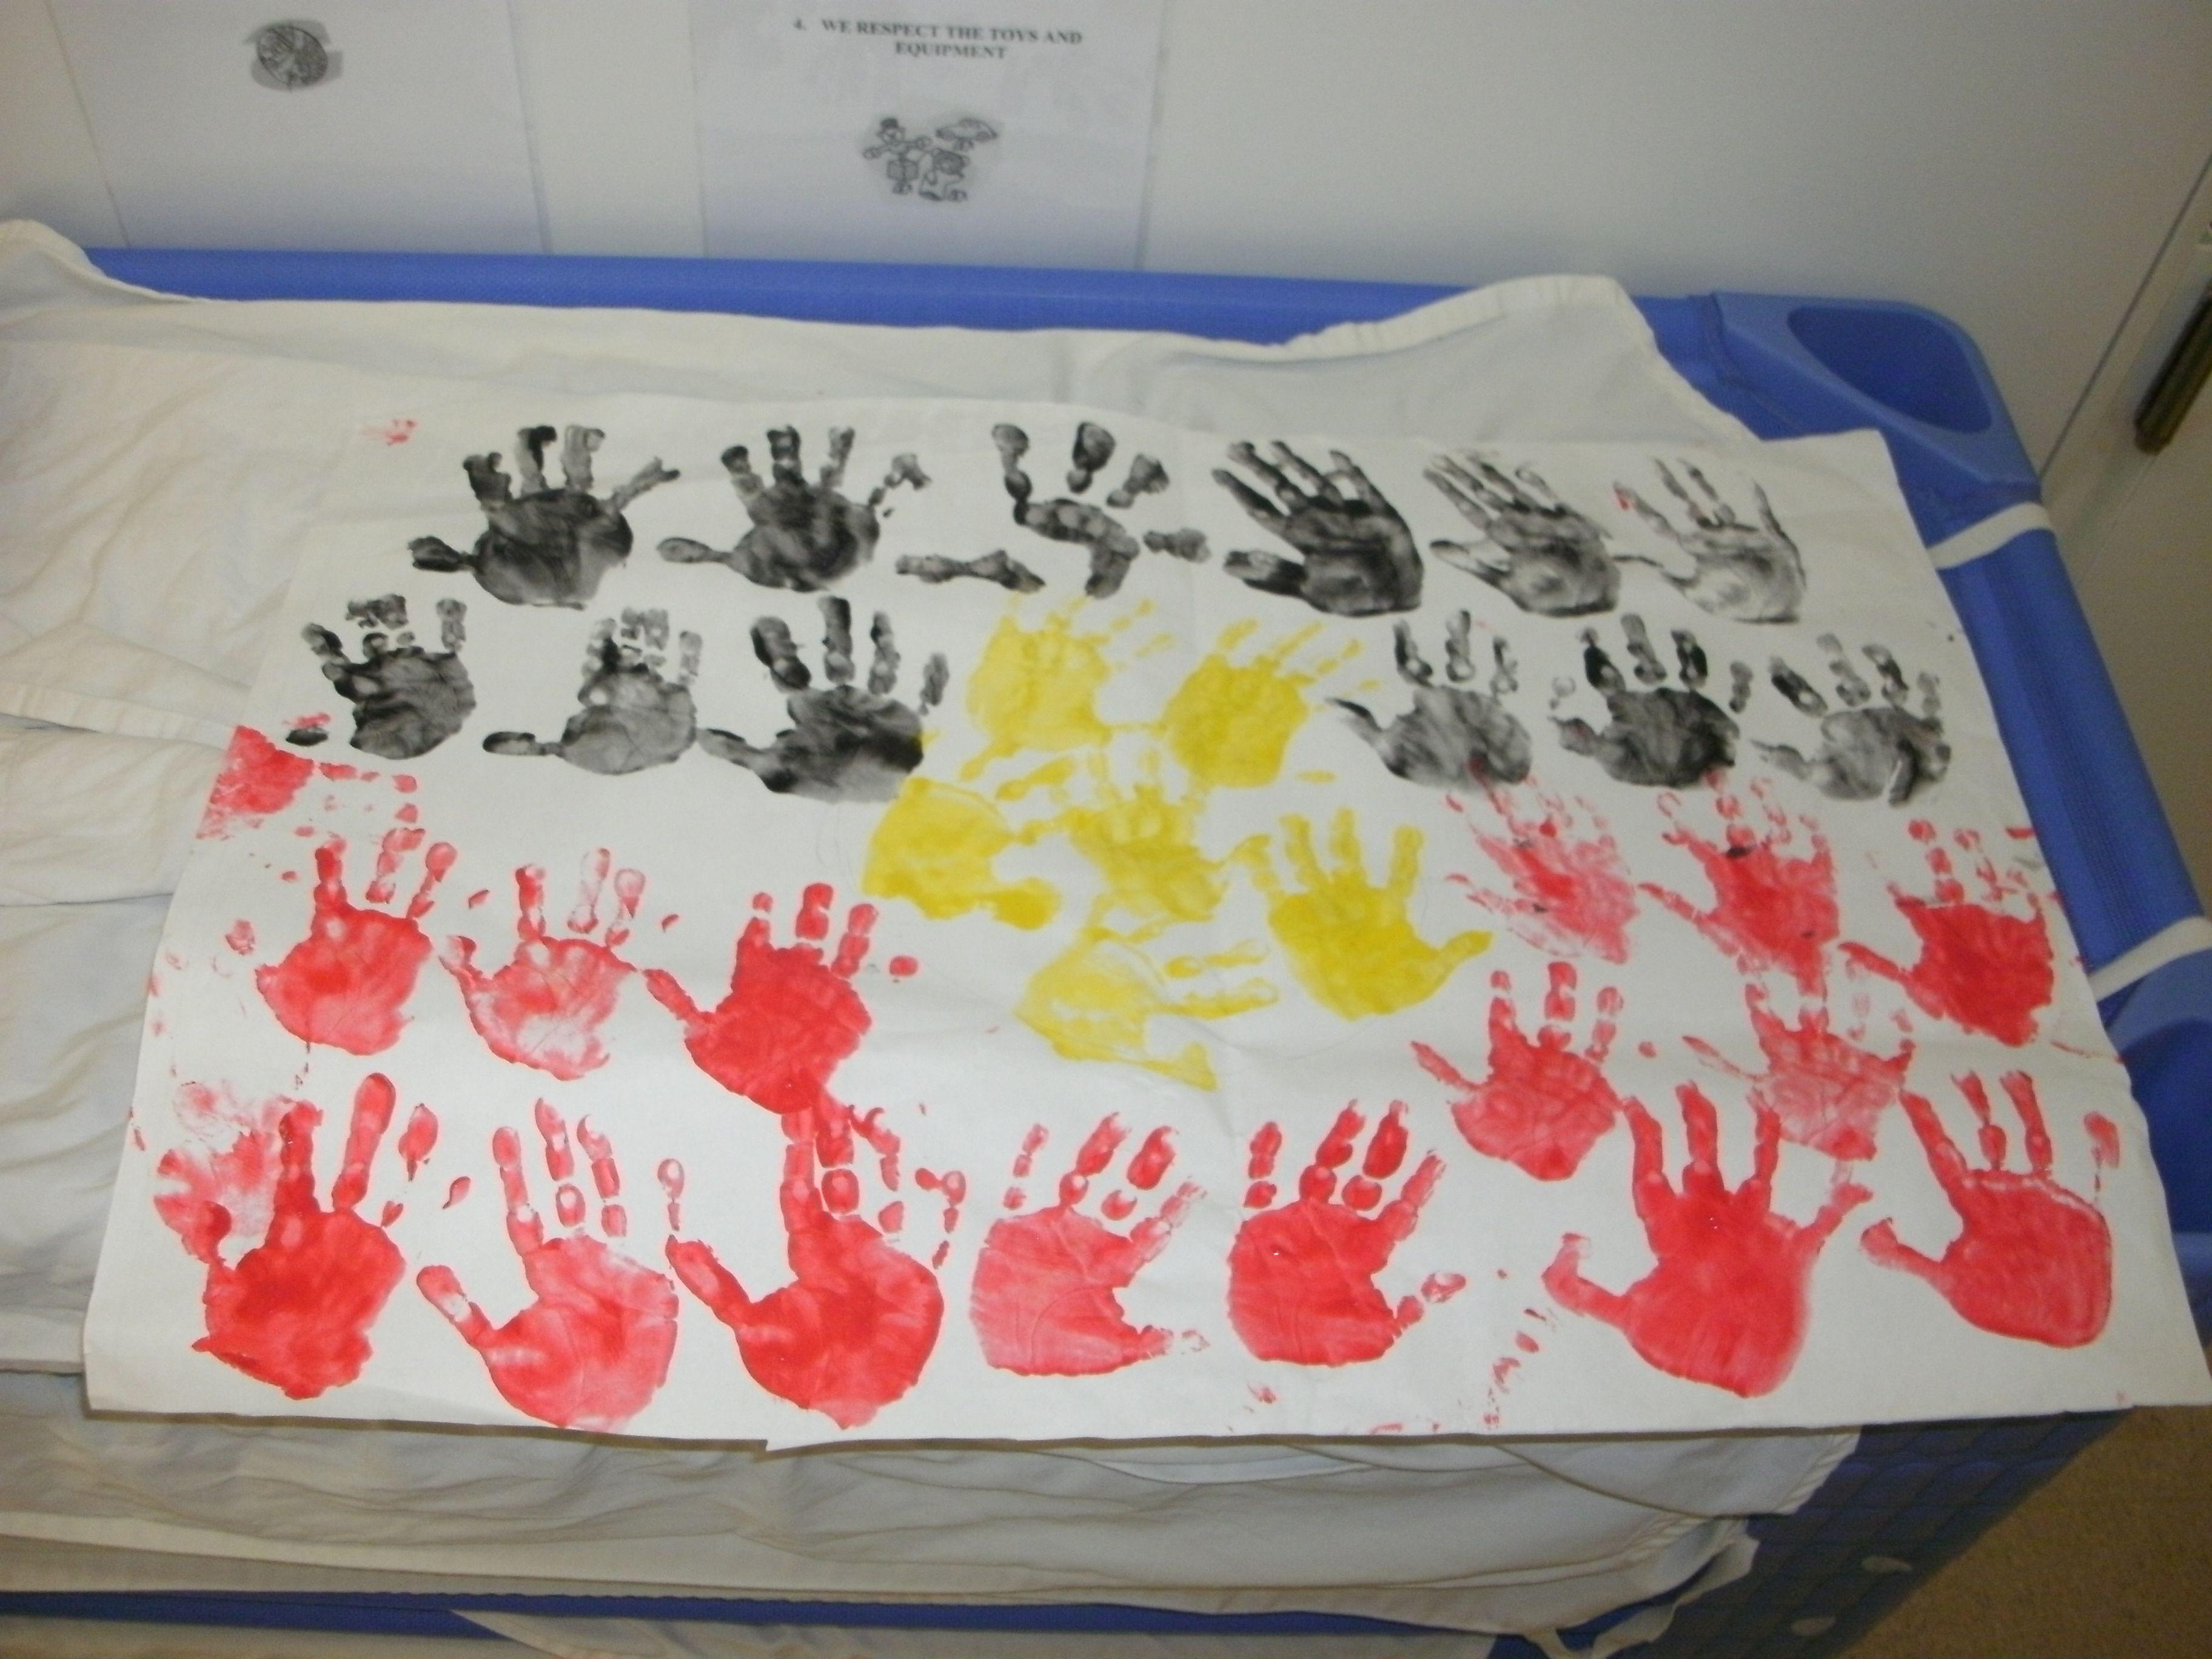 aboriginal art activities for preschoolers naidoc week print flag juniors room 2012 248